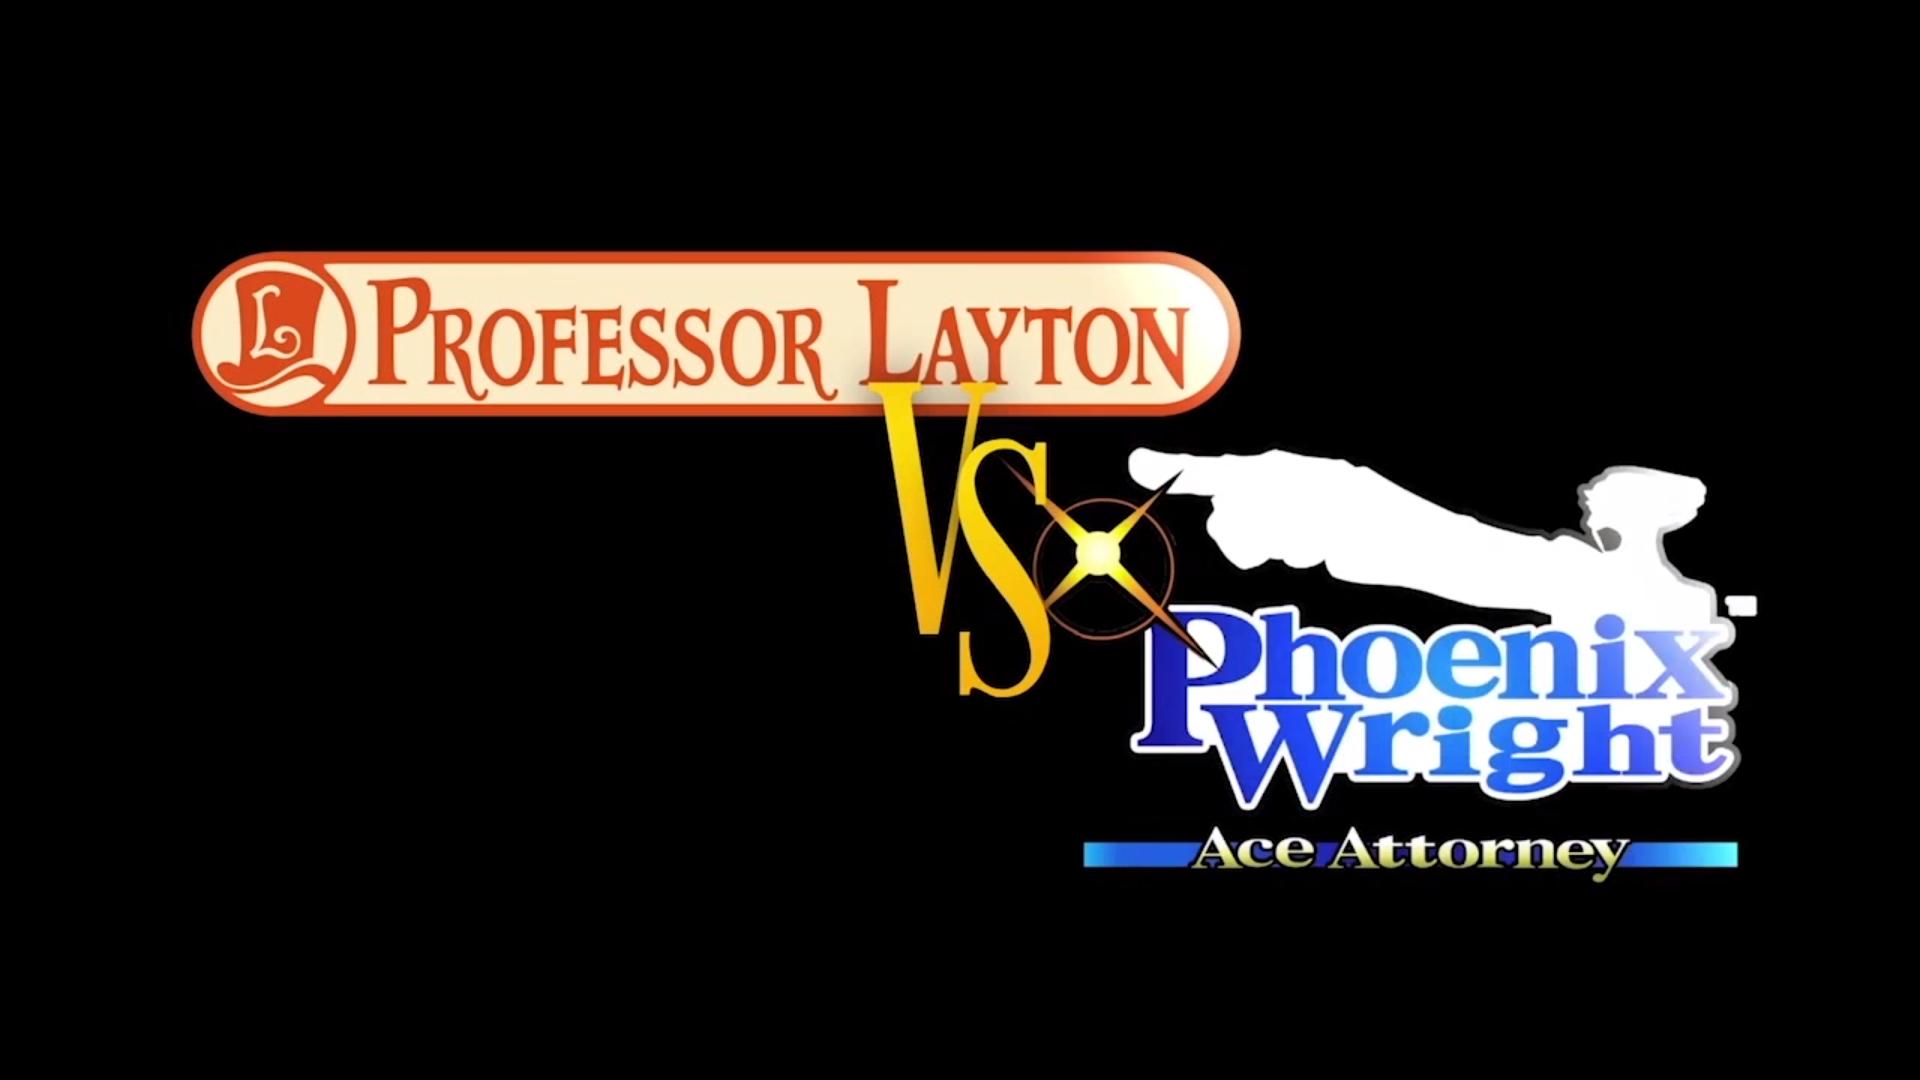 Phoenix Wright vs Professor Layton